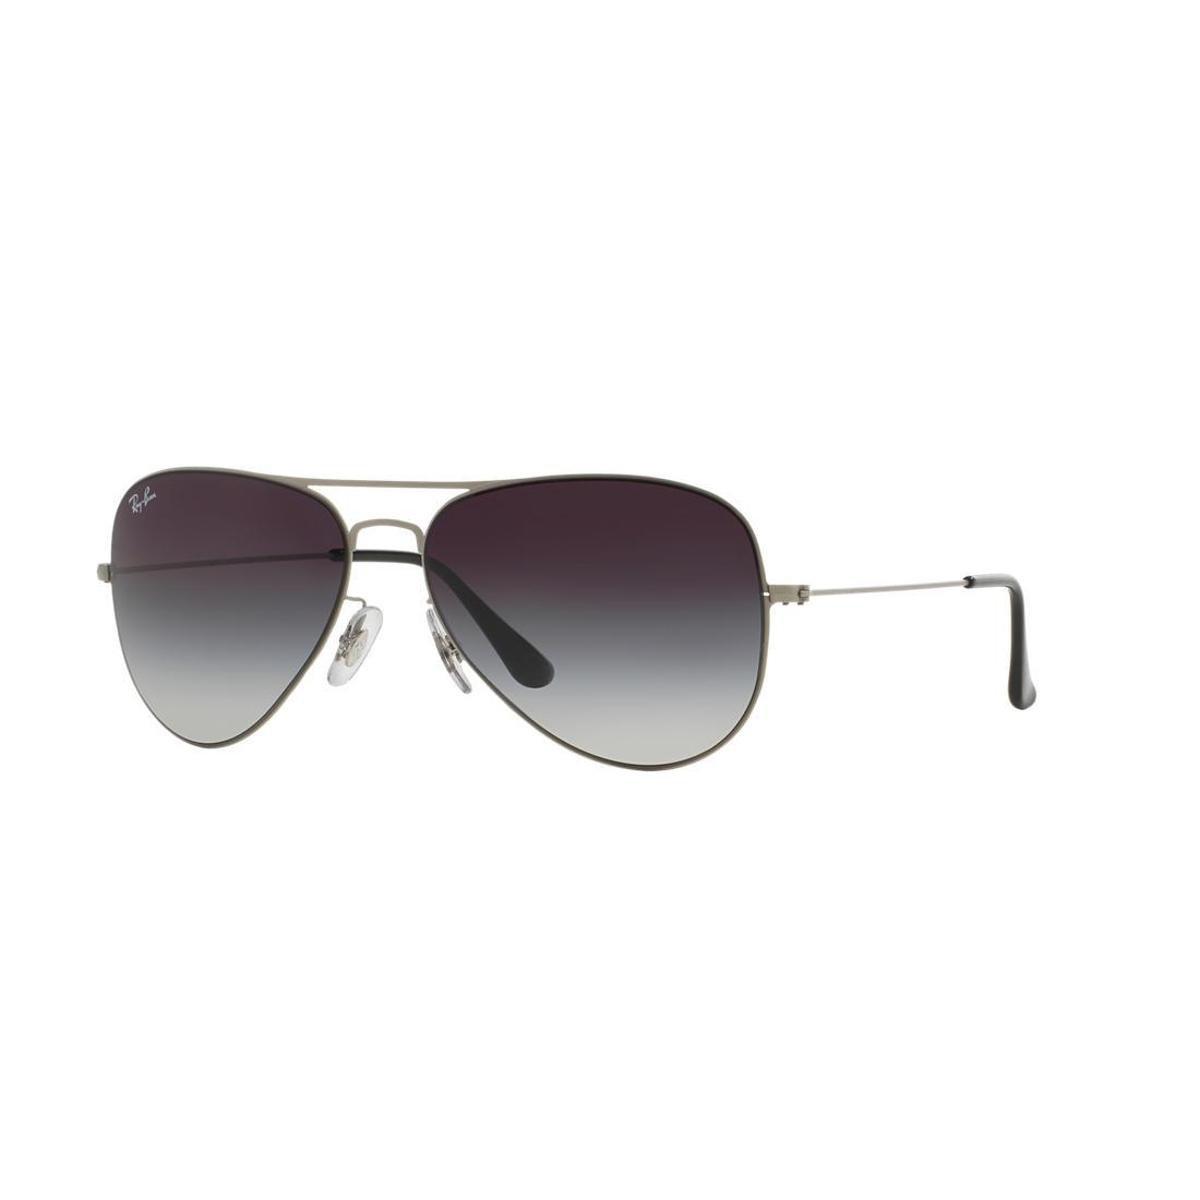 Óculos de Sol Ray-Ban RB3513 Aviator Flat Metal - Compre Agora   Zattini 92cbabeb02